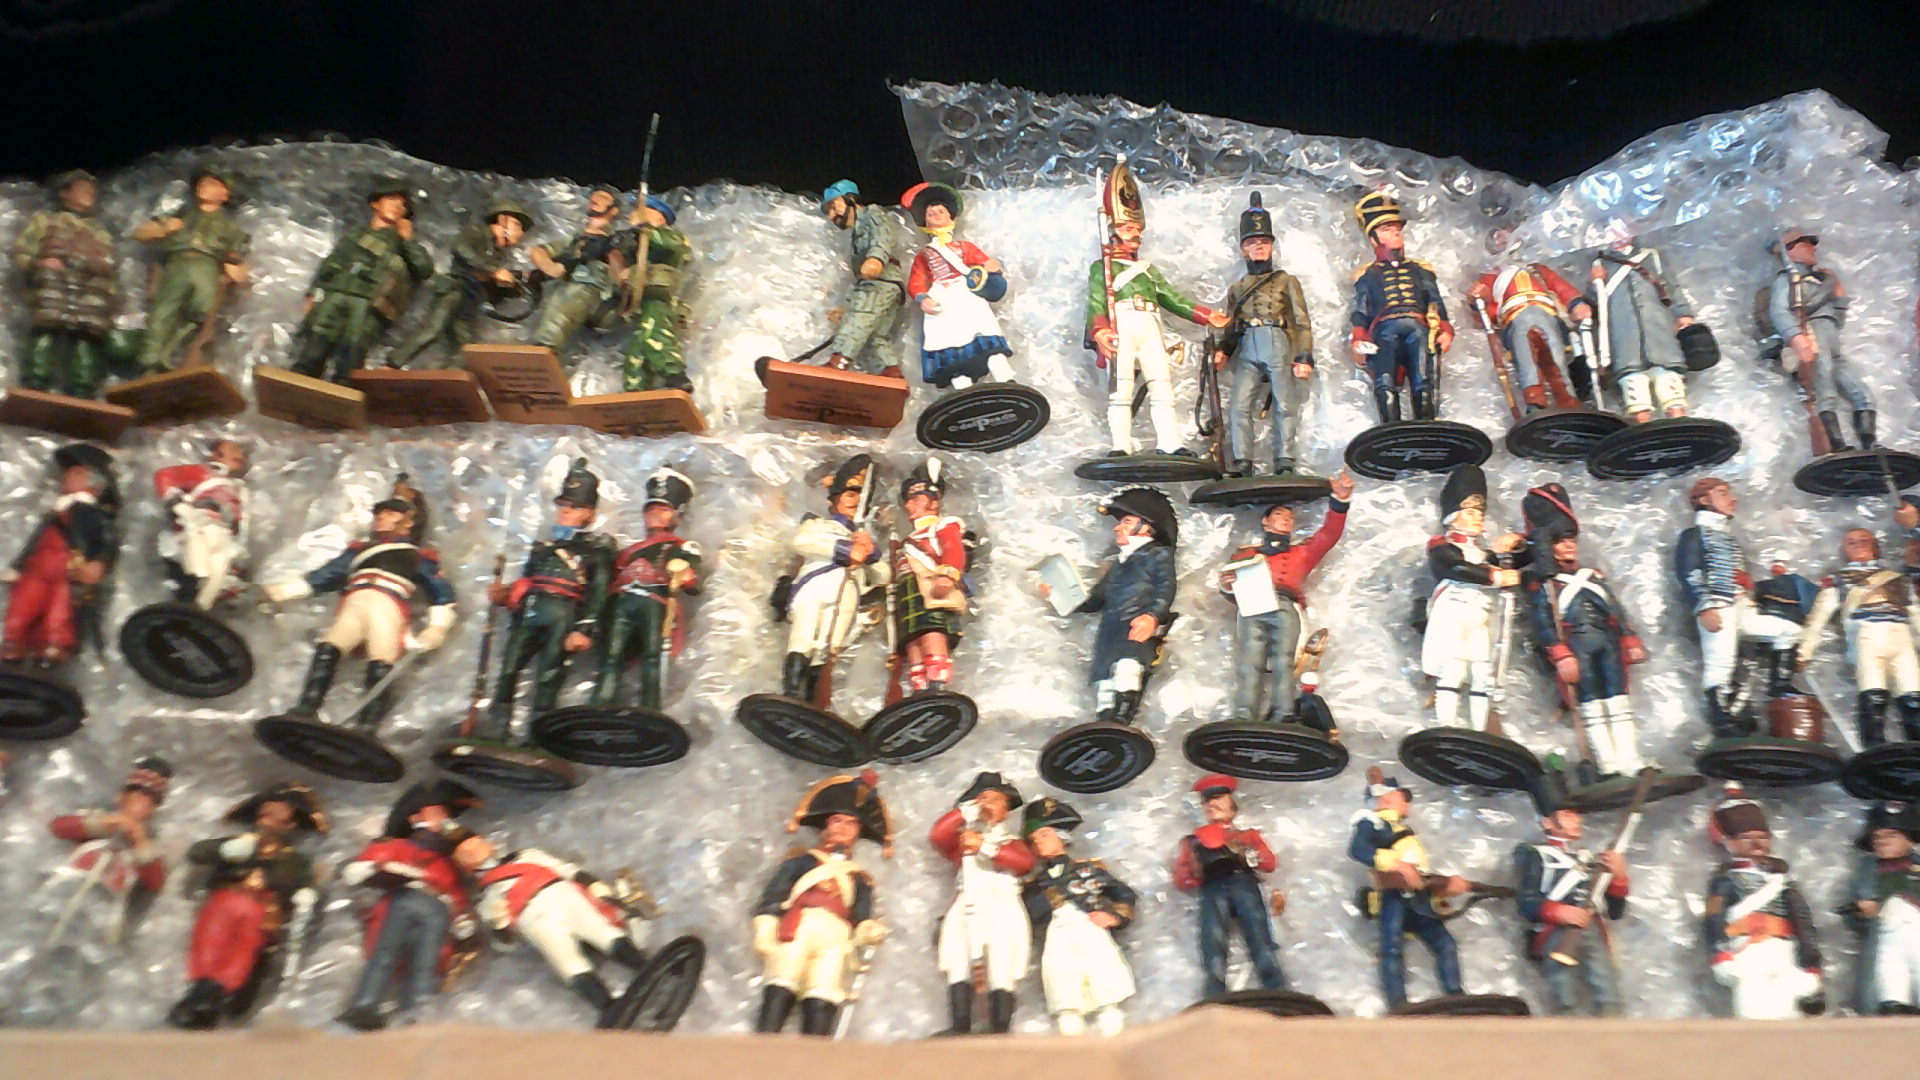 Lot 400 - Del Prado Soldiers-unboxed (approx. 100)- excellent condition